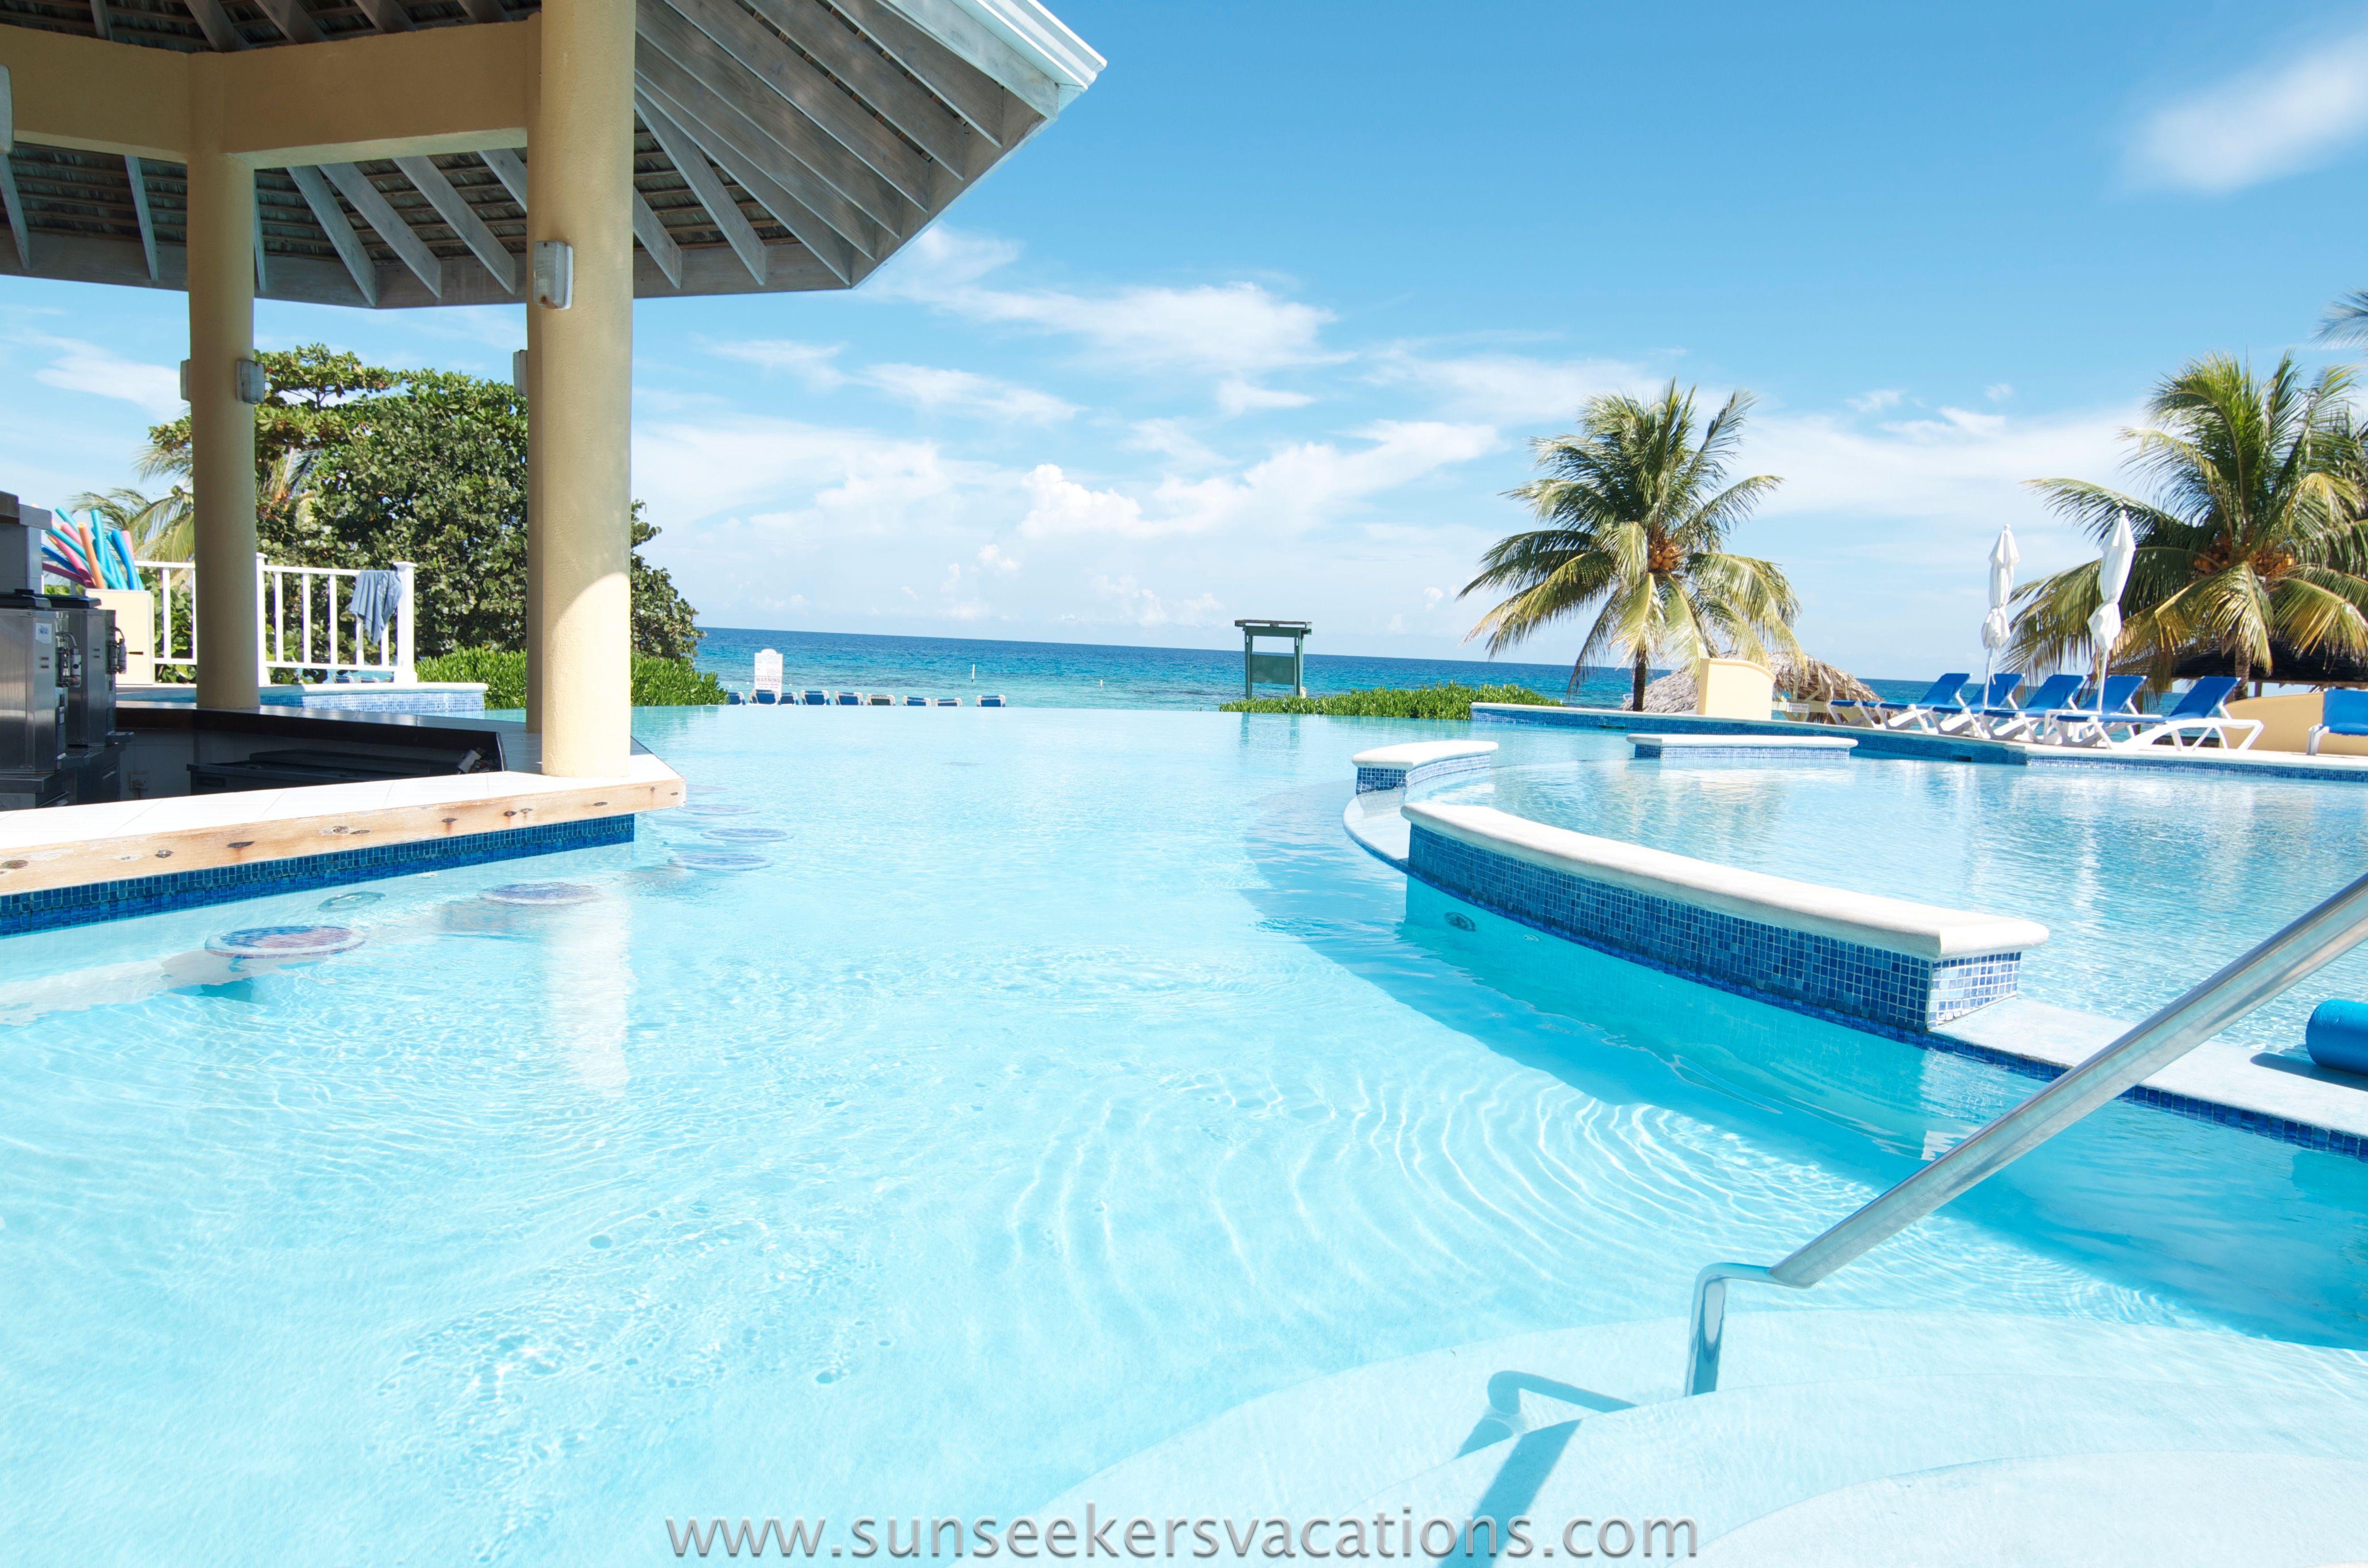 Swim Up Bar Infinity Pool At Jewel Runaway Bay Jewel Runaway Bay